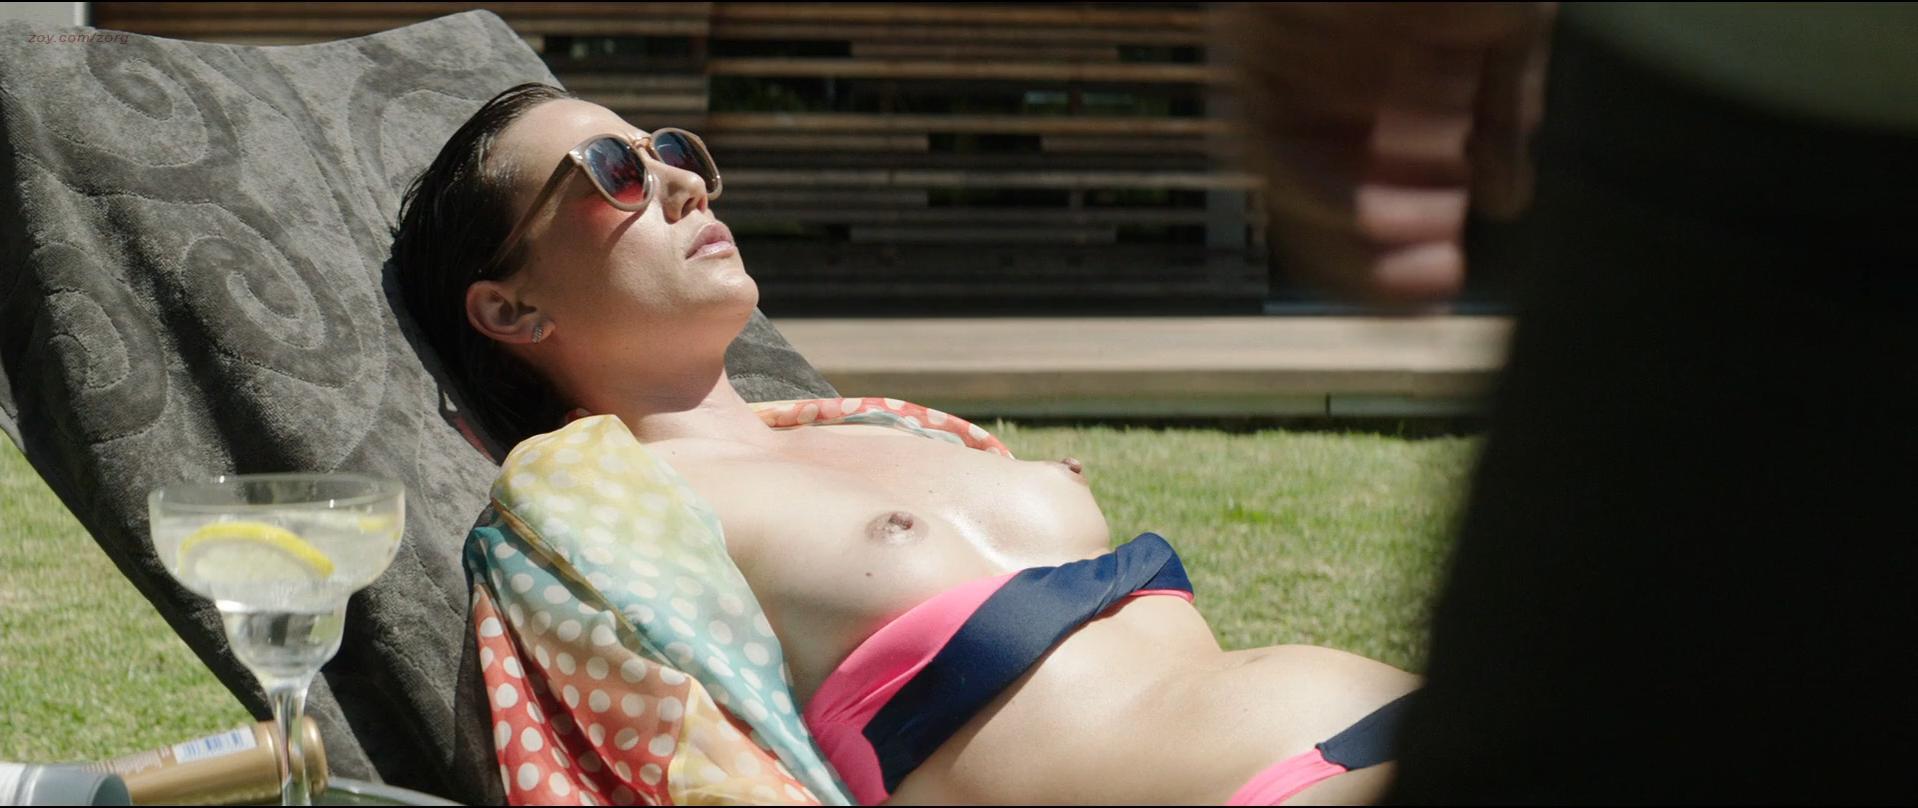 Audrey nicole nude tits